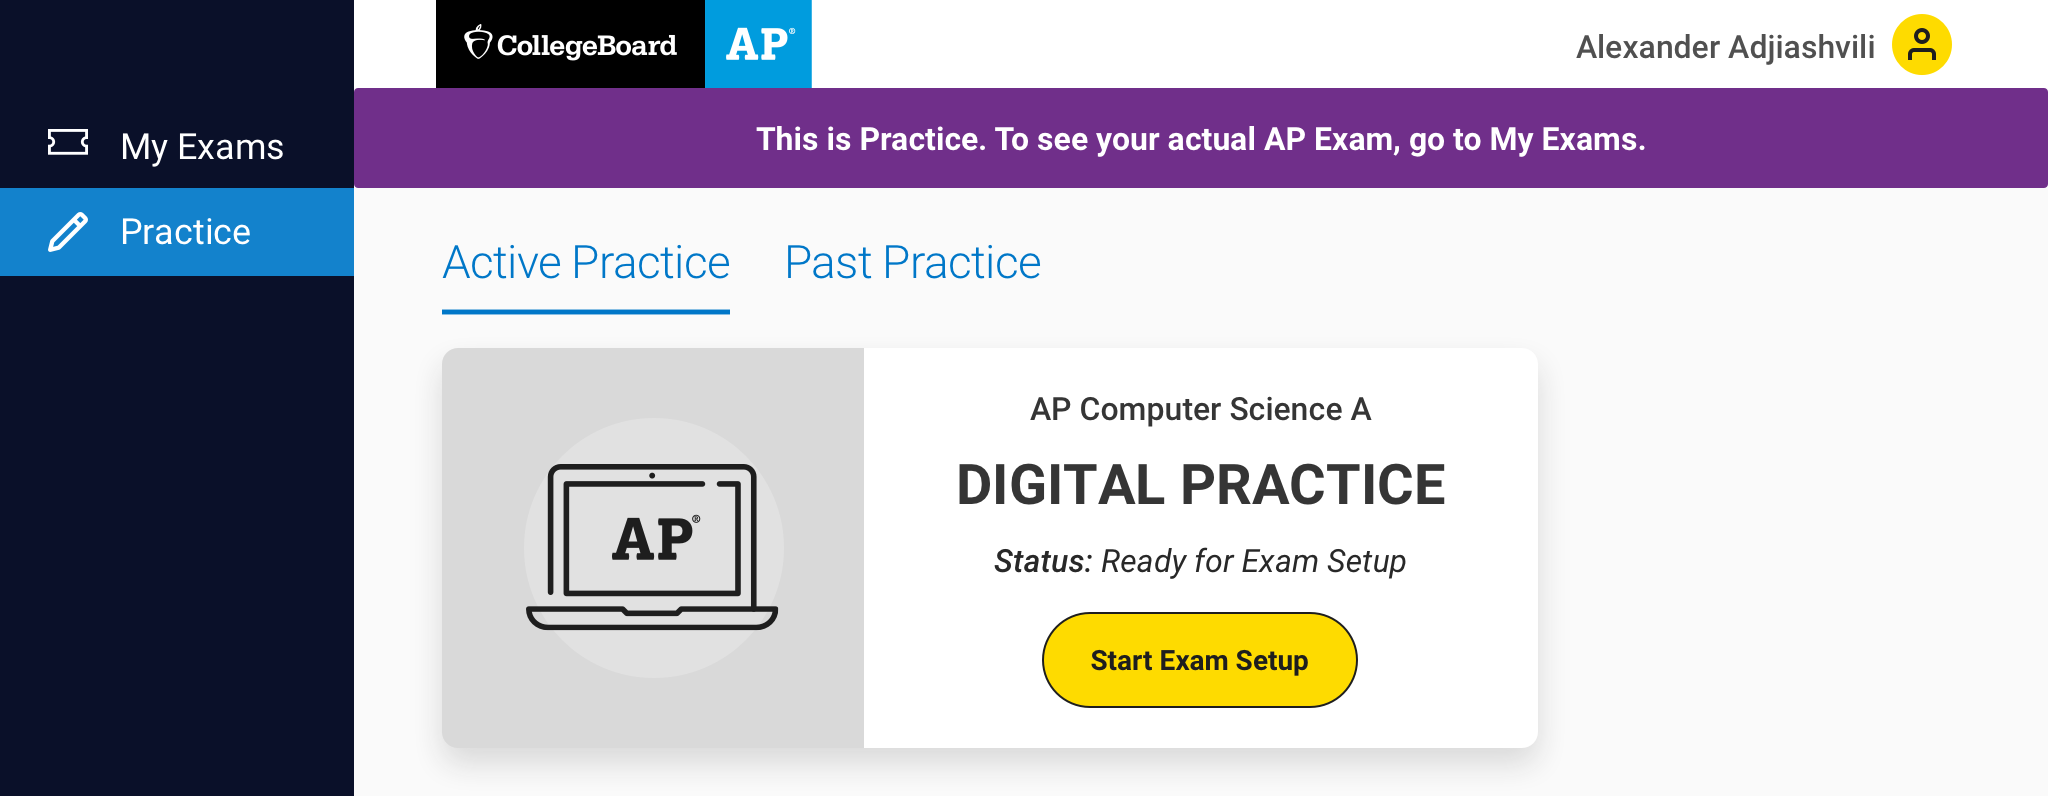 2021 AP Digital Exams - Practice